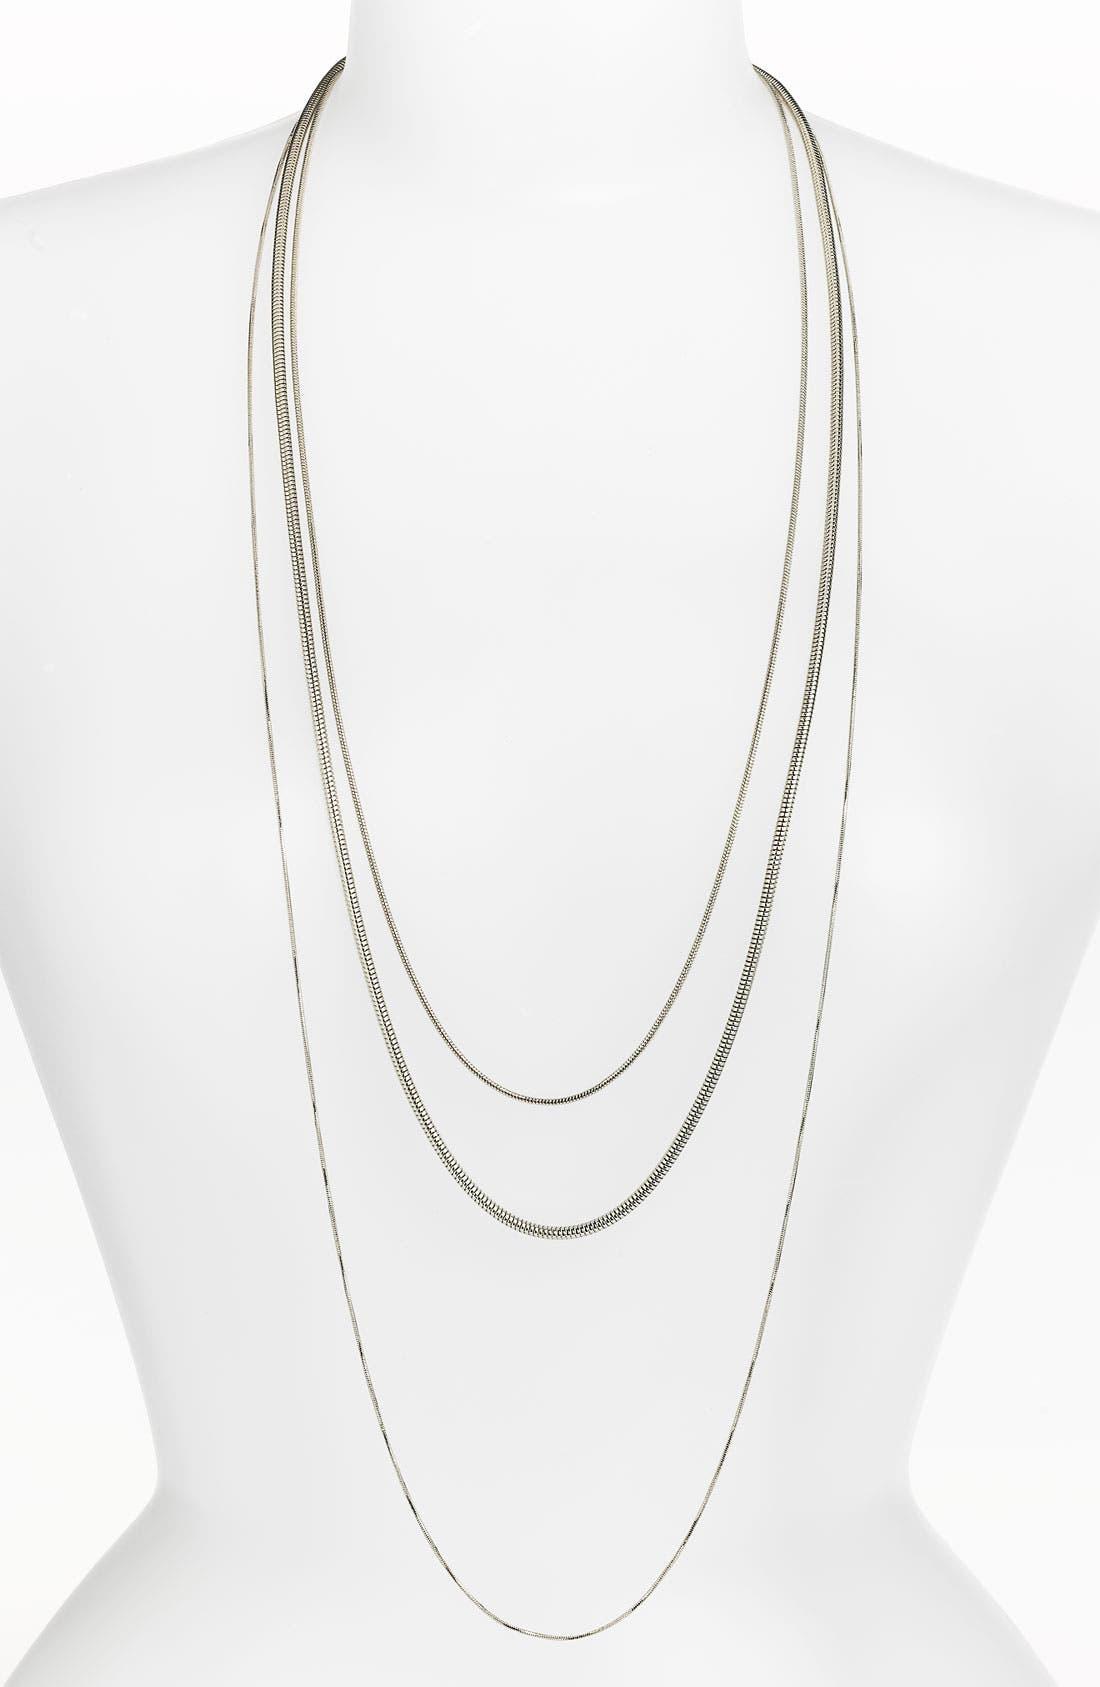 Main Image - BP. Multi Chain Necklace